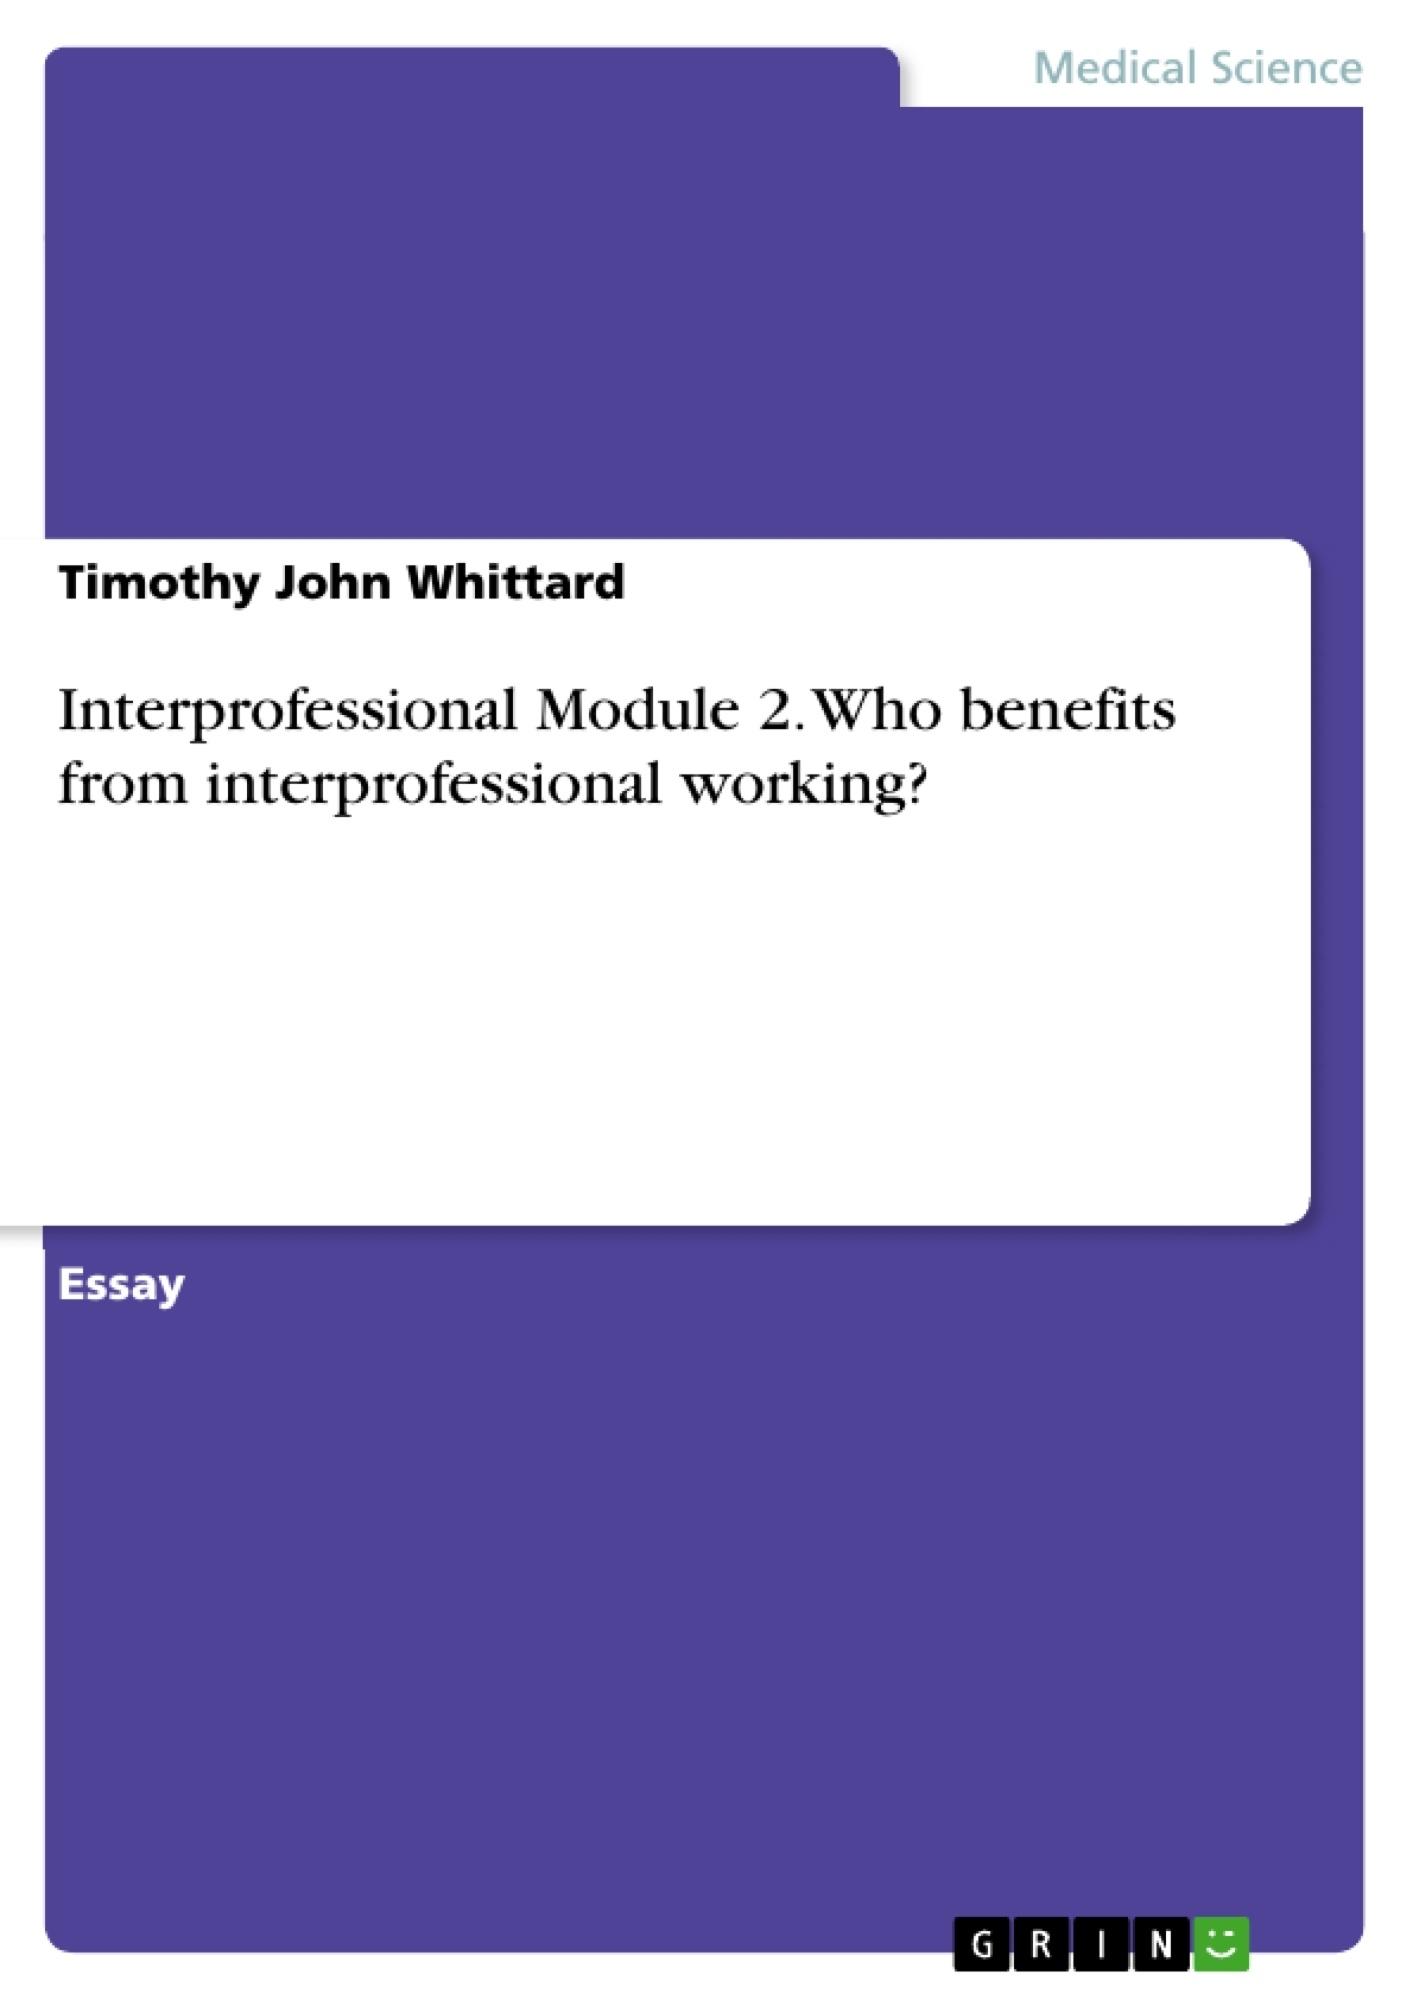 Title: Interprofessional Module 2. Who benefits from interprofessional working?